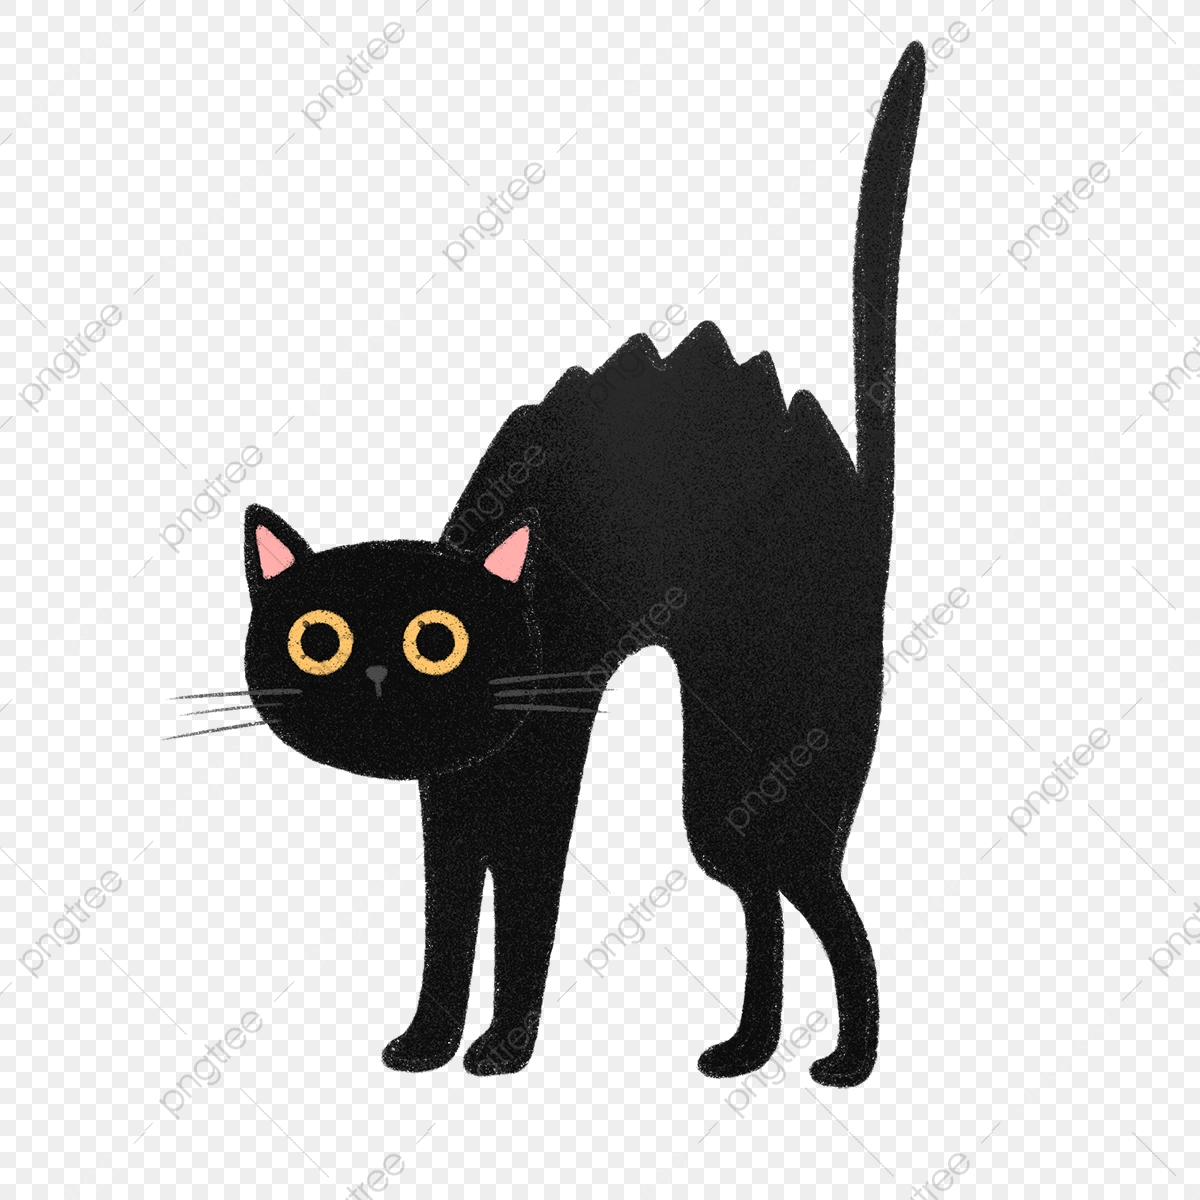 Hand Drawn Cute Scared Black Cat, Scared, Cartoon, Pet PNG ...